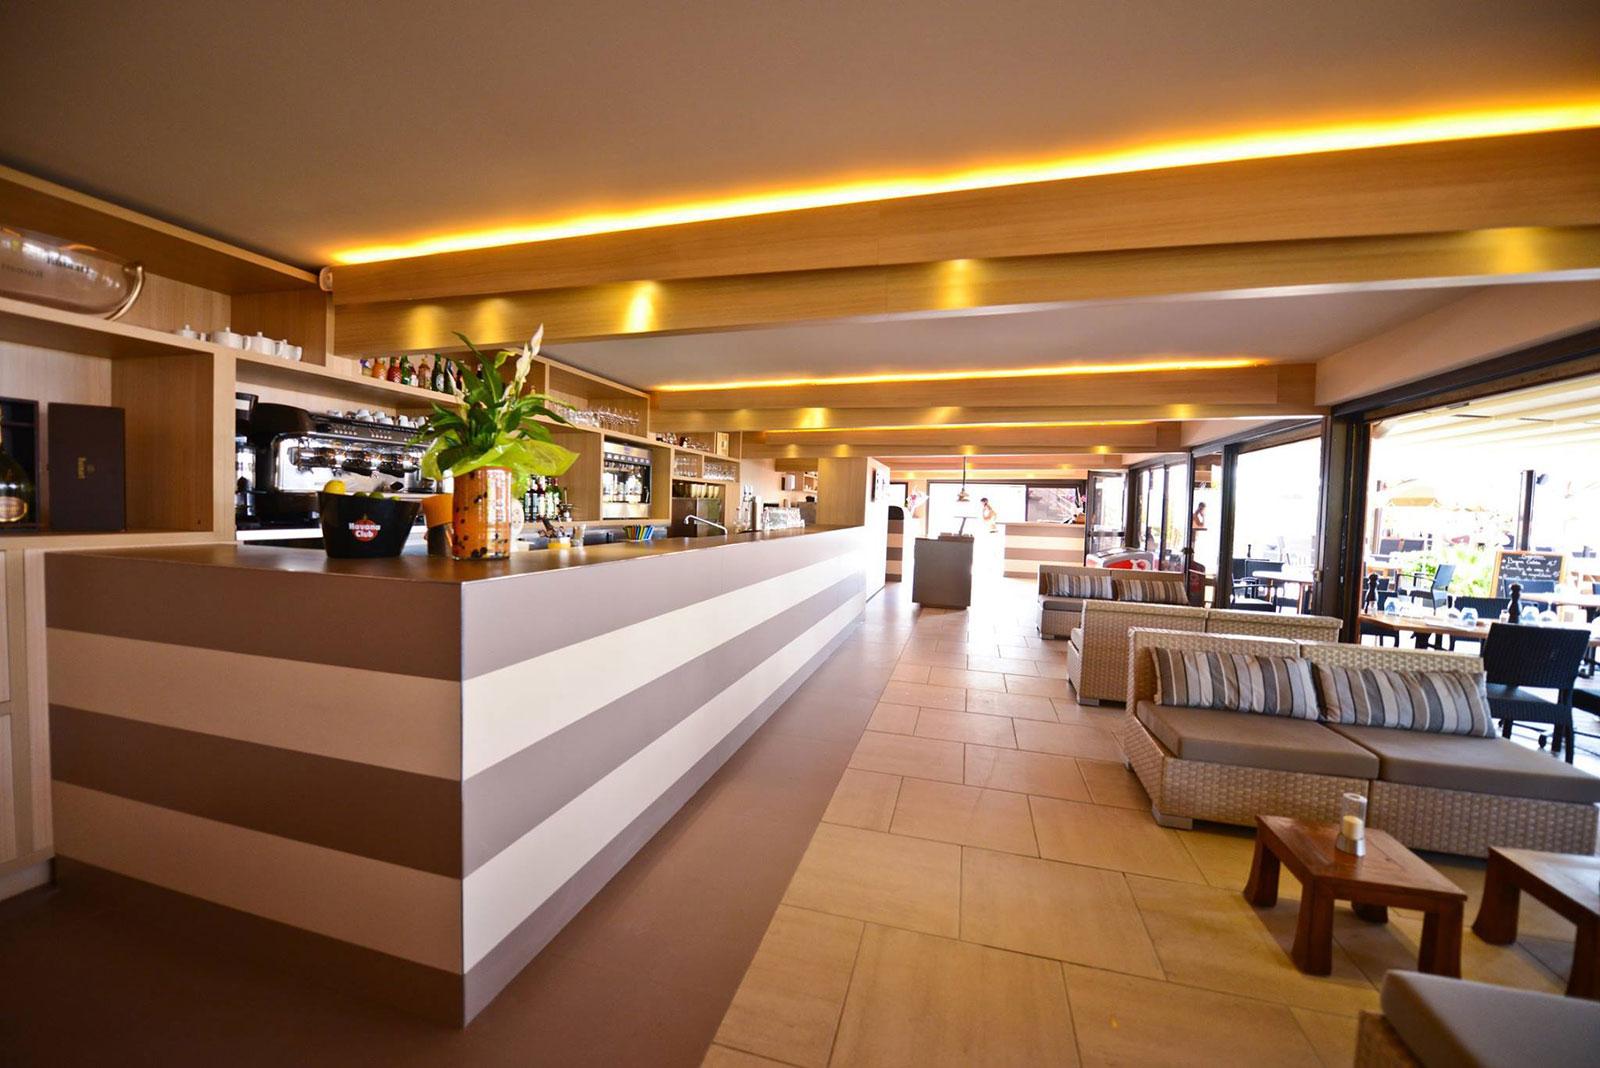 plage-restaurant-antibes-juan-les-pins-3